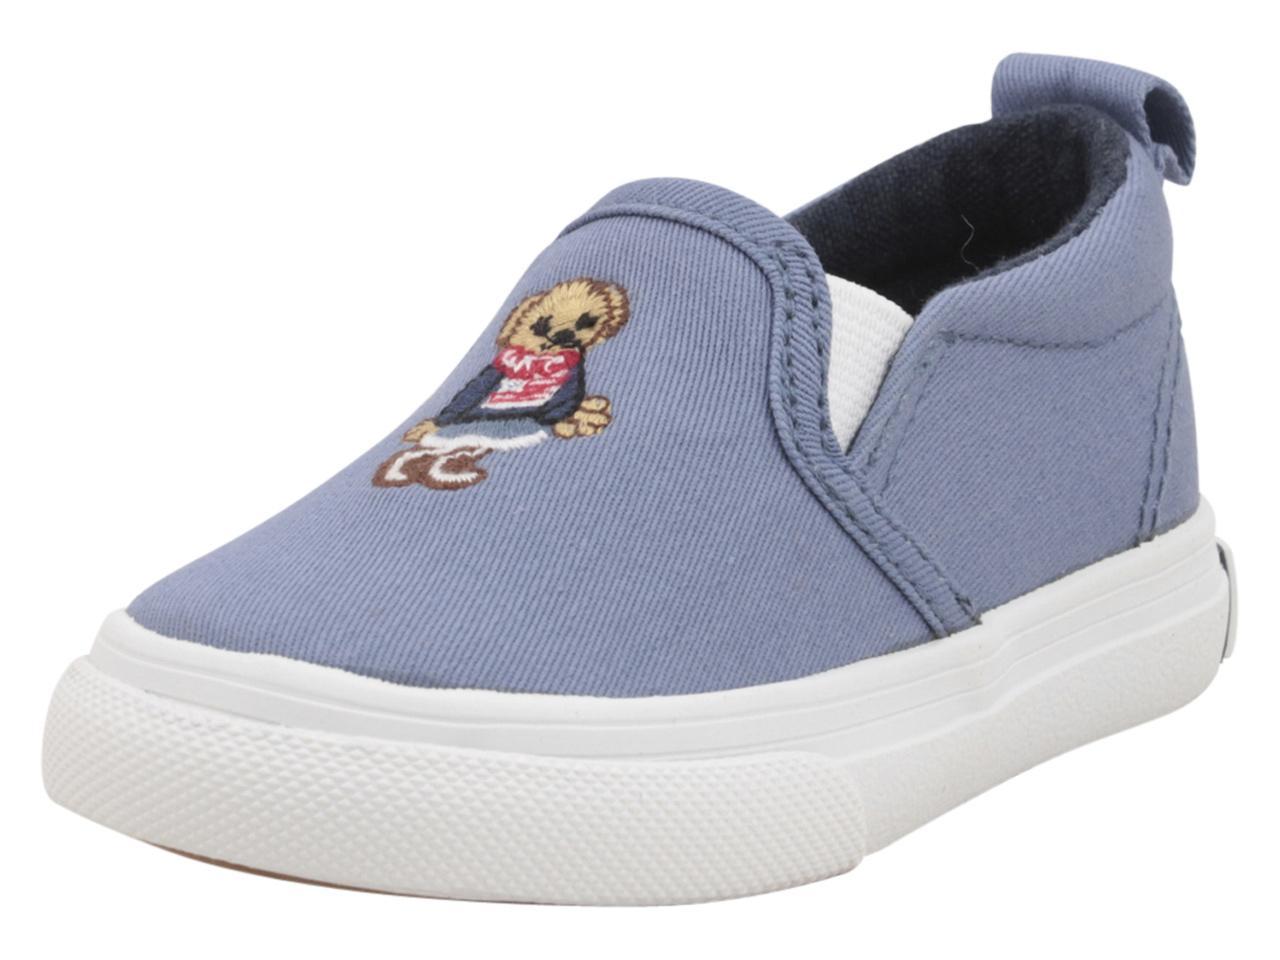 978ca3652ed Polo Ralph Lauren Toddler Little Girl s Carlee Bear Sneakers Shoes